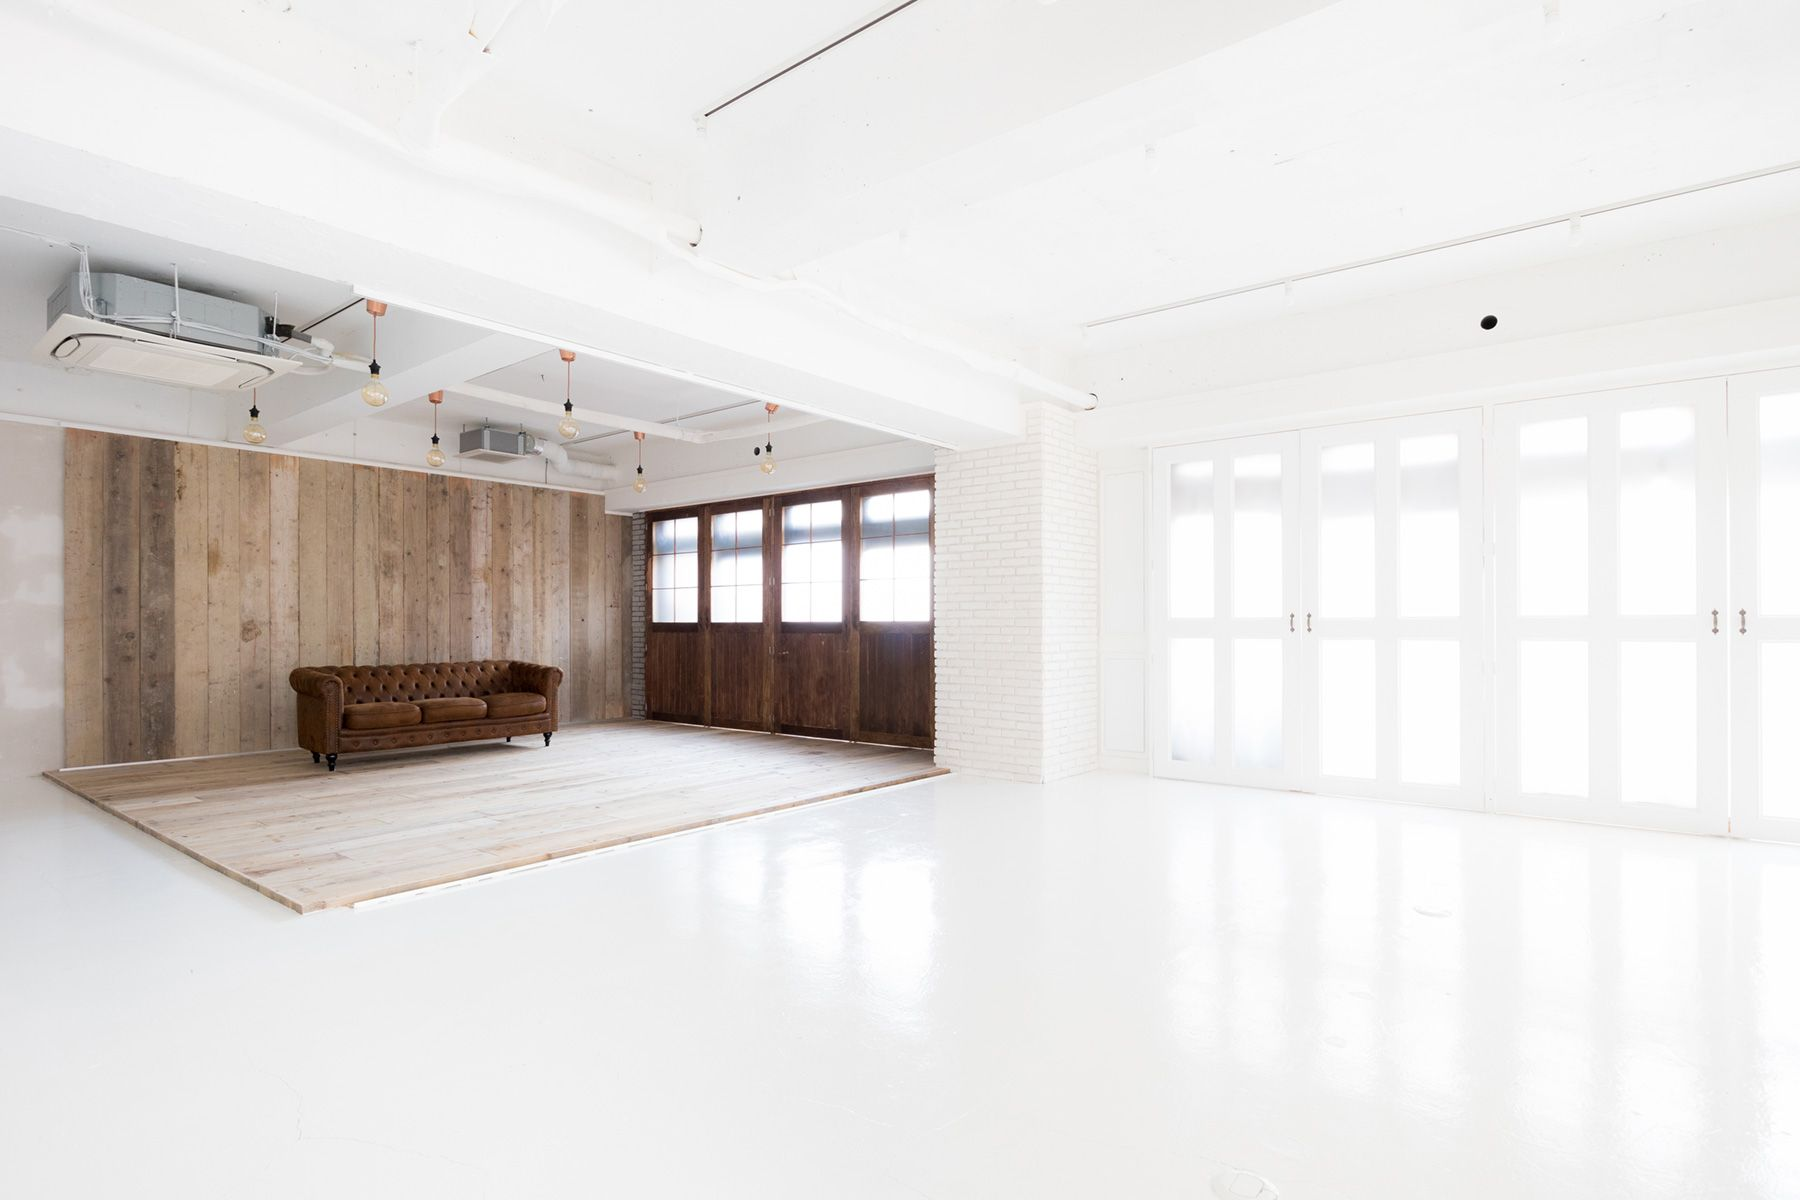 Studio Serato 笹塚 (スタジオセラート笹塚)別シチュエーションも